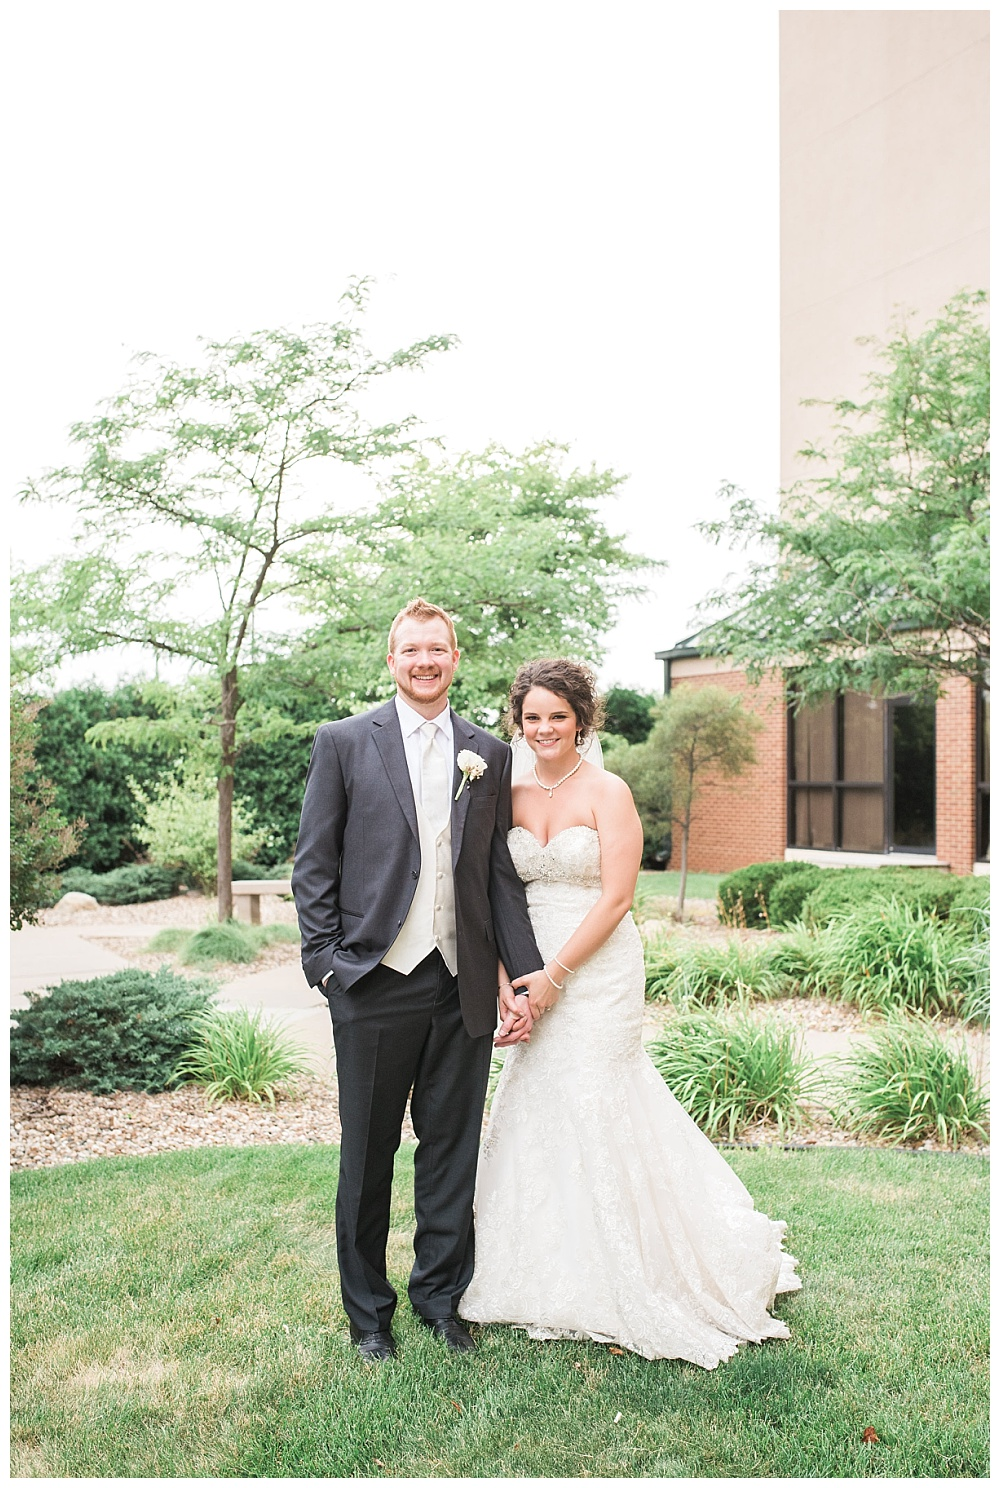 Stephanie Marie Photography Echo Hill Presbyterian Church Marriott Cedar Rapids Iowa City Wedding Photographer Tom Meghan 1